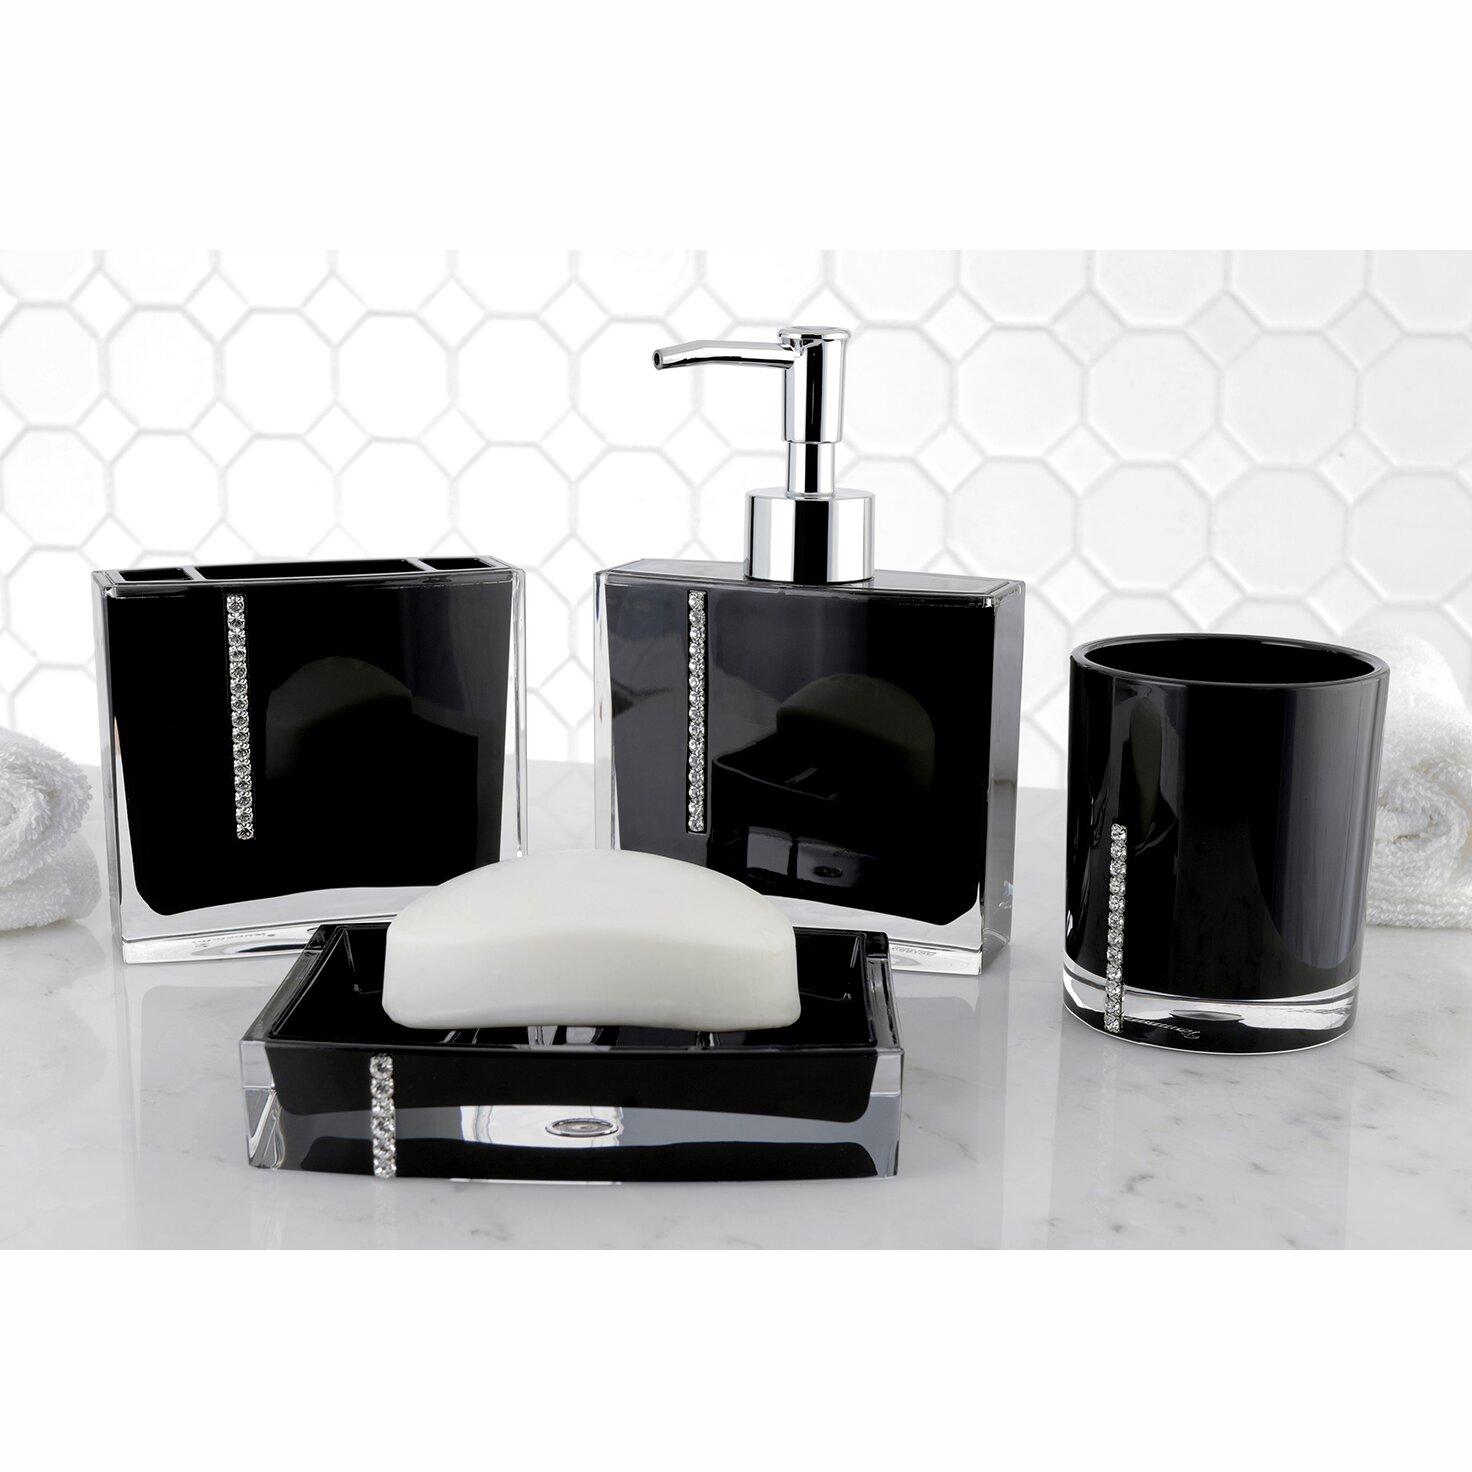 Kingston brass capitol 4 piece bath accessory set for Bathroom 4 piece set